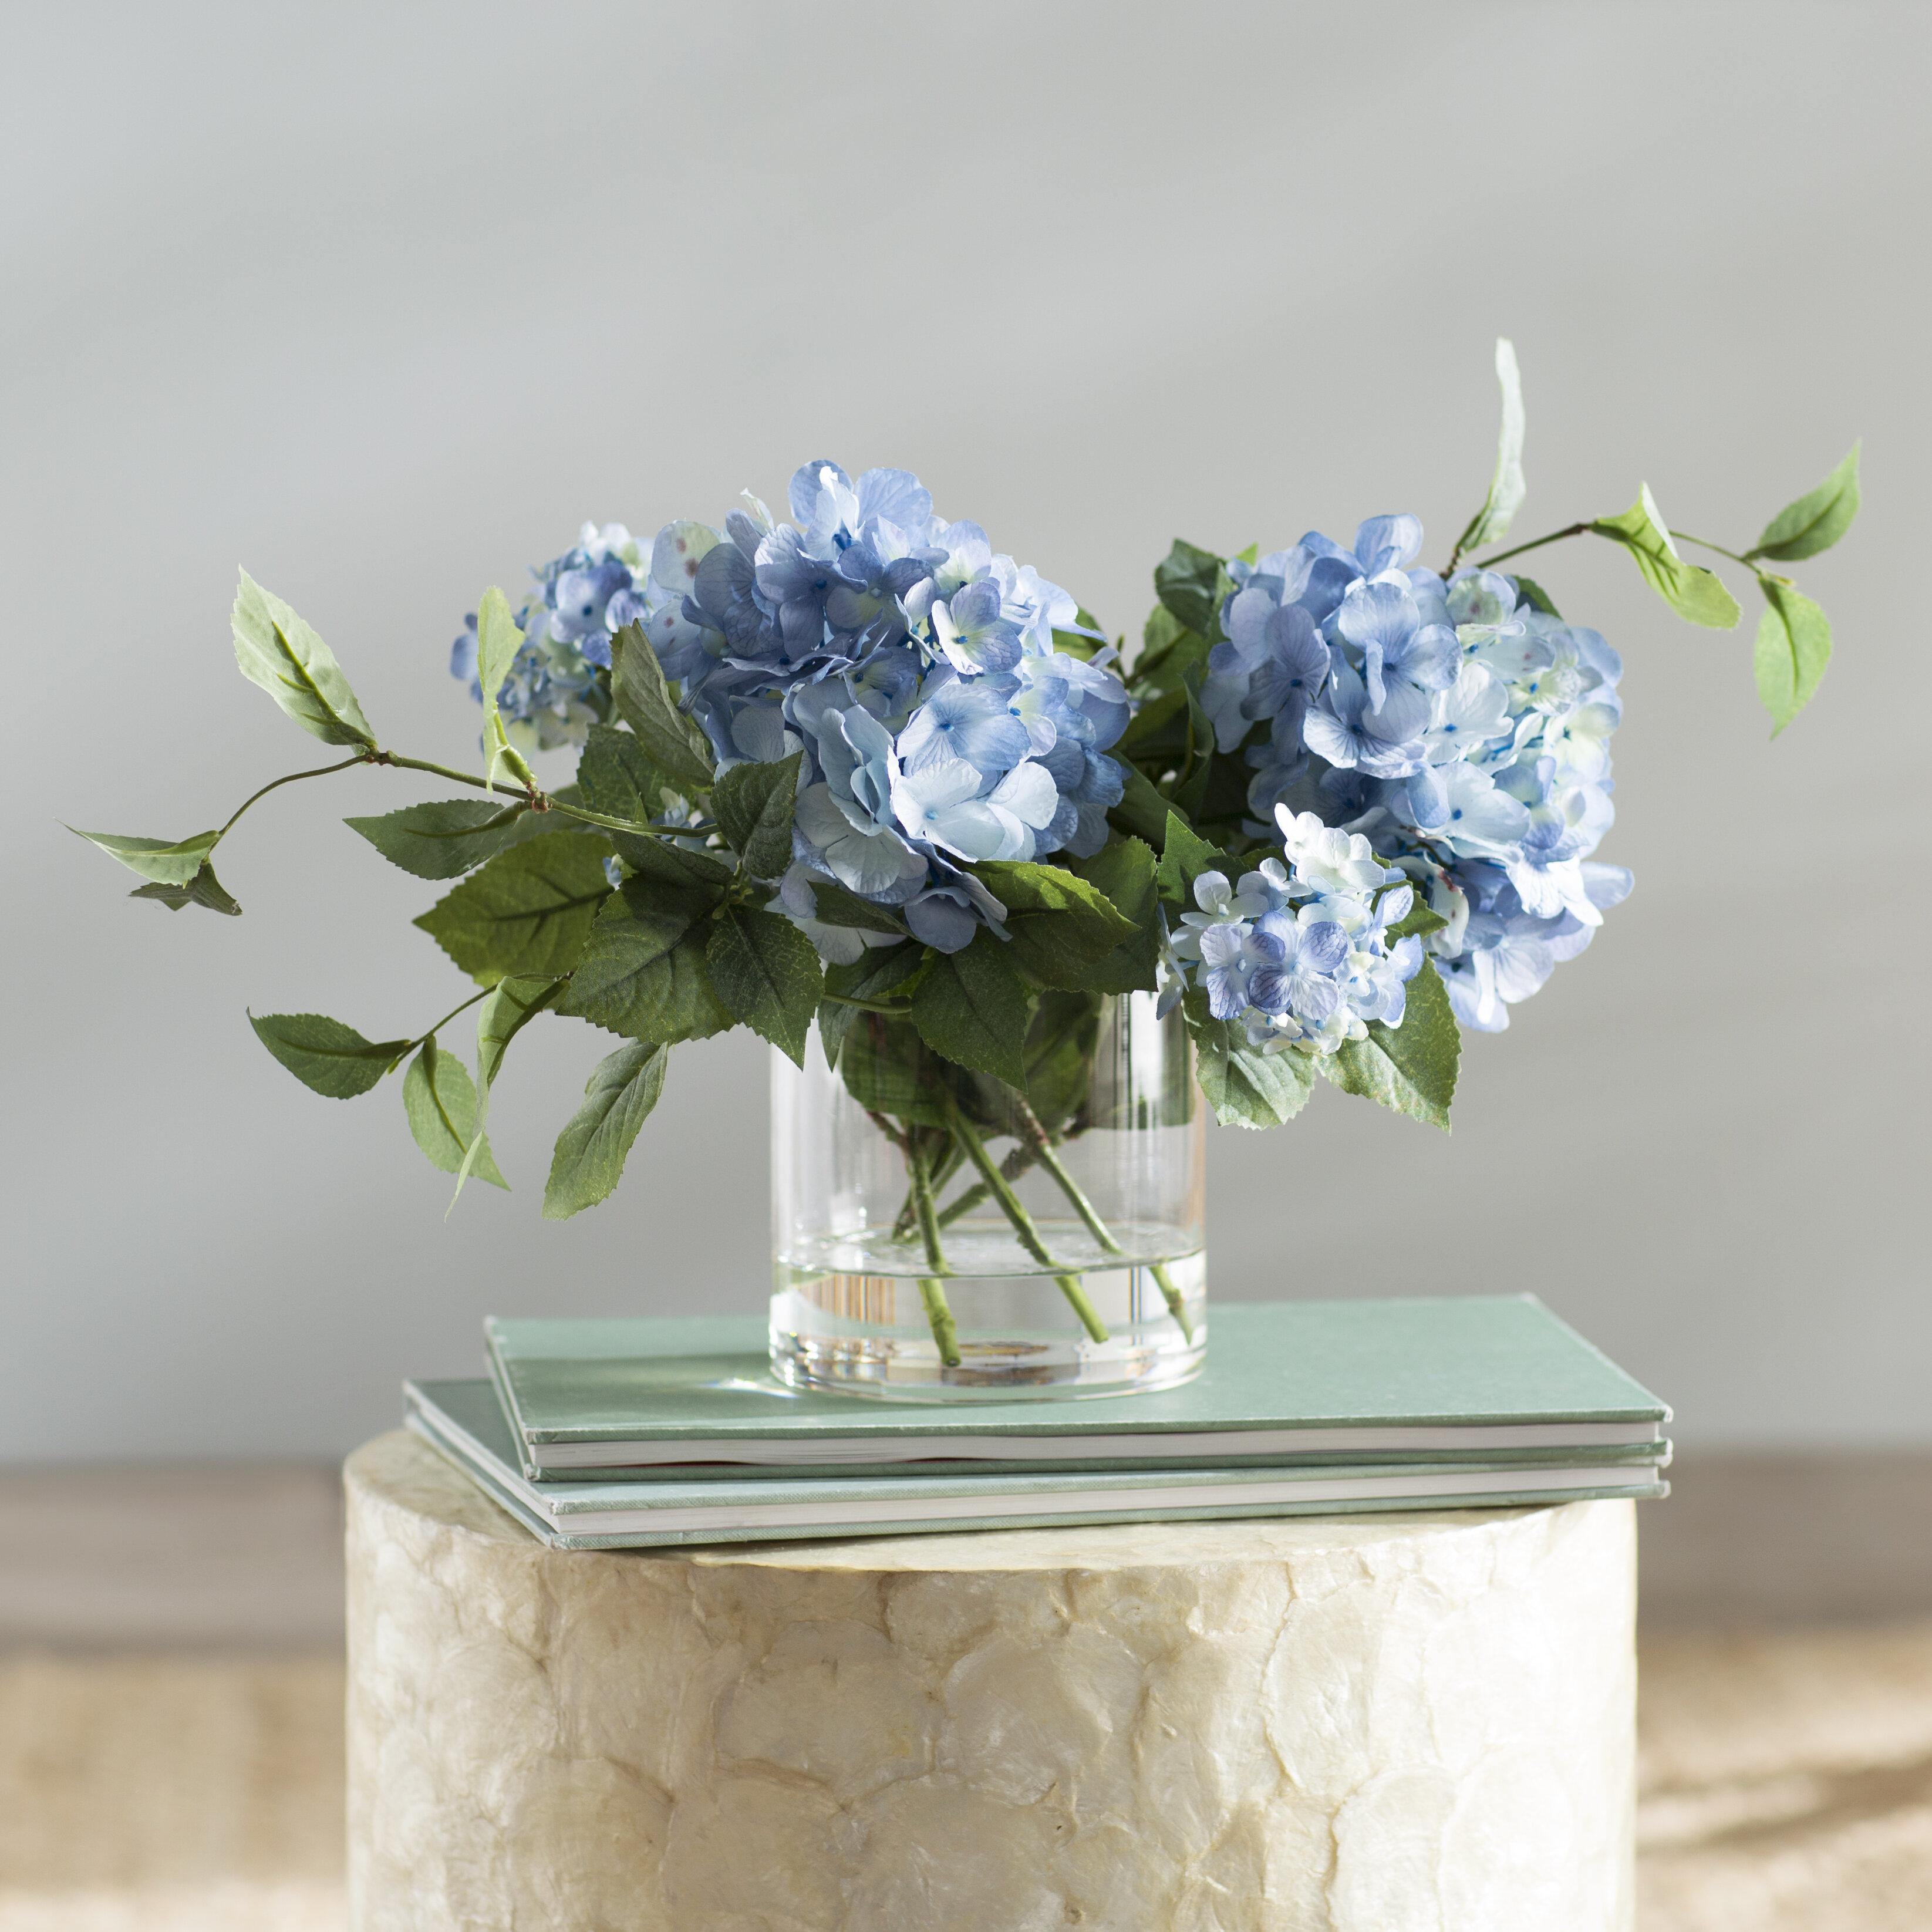 Bon Beachcrest Home Hydrangea Flower Spray Arrangement U0026 Reviews | Wayfair